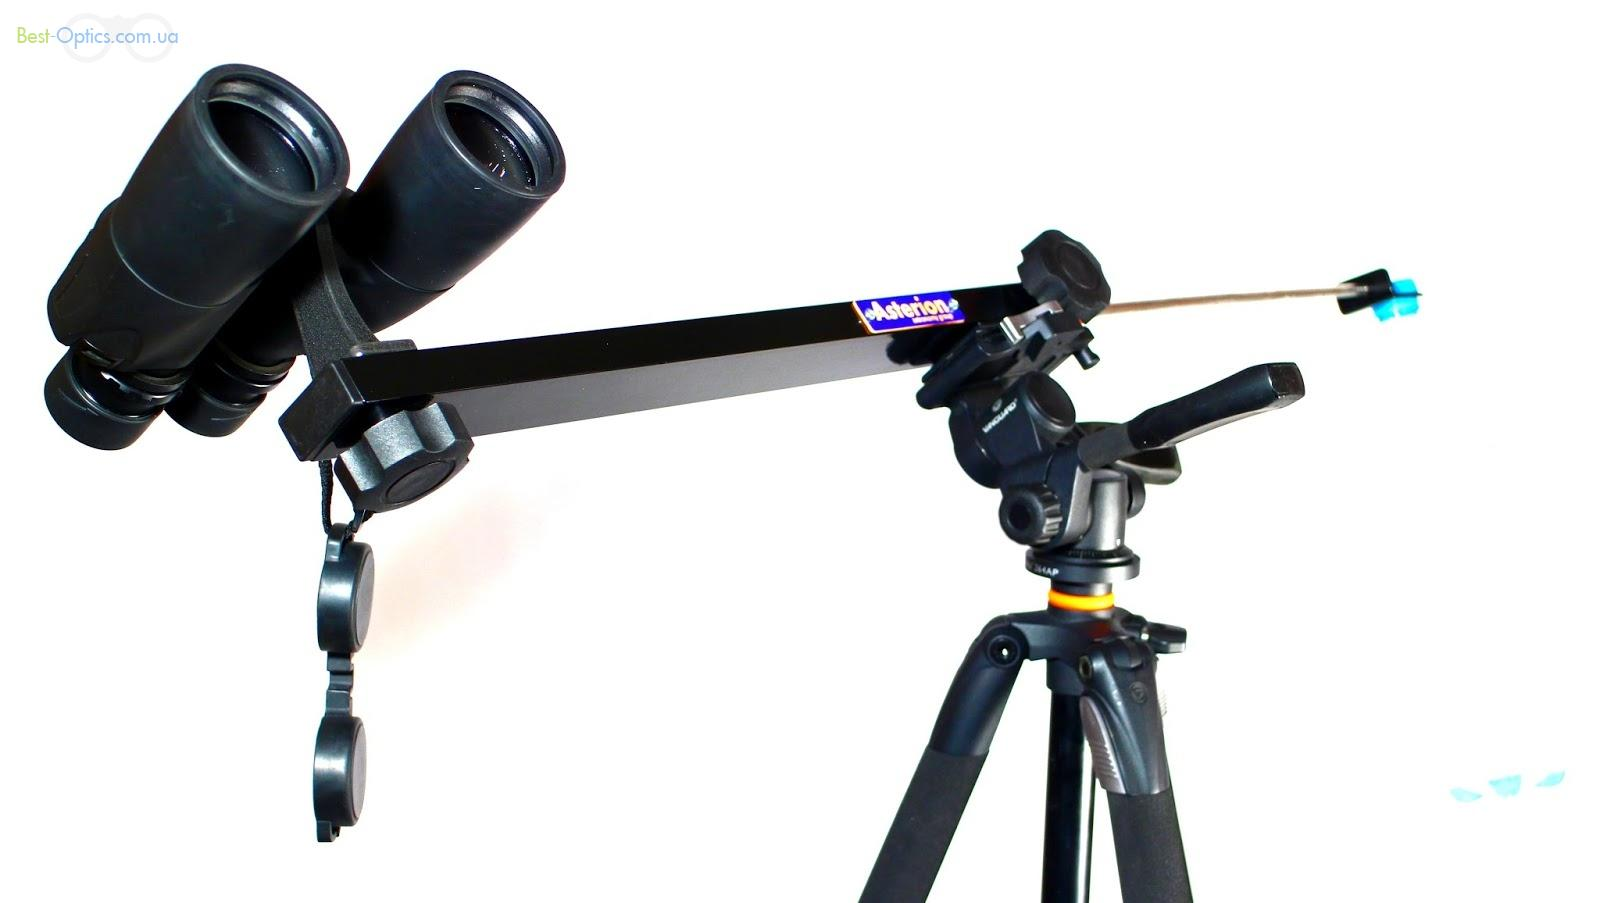 Asterion Parabino Travel - кронштейн для установки бинокля на фотоштатив